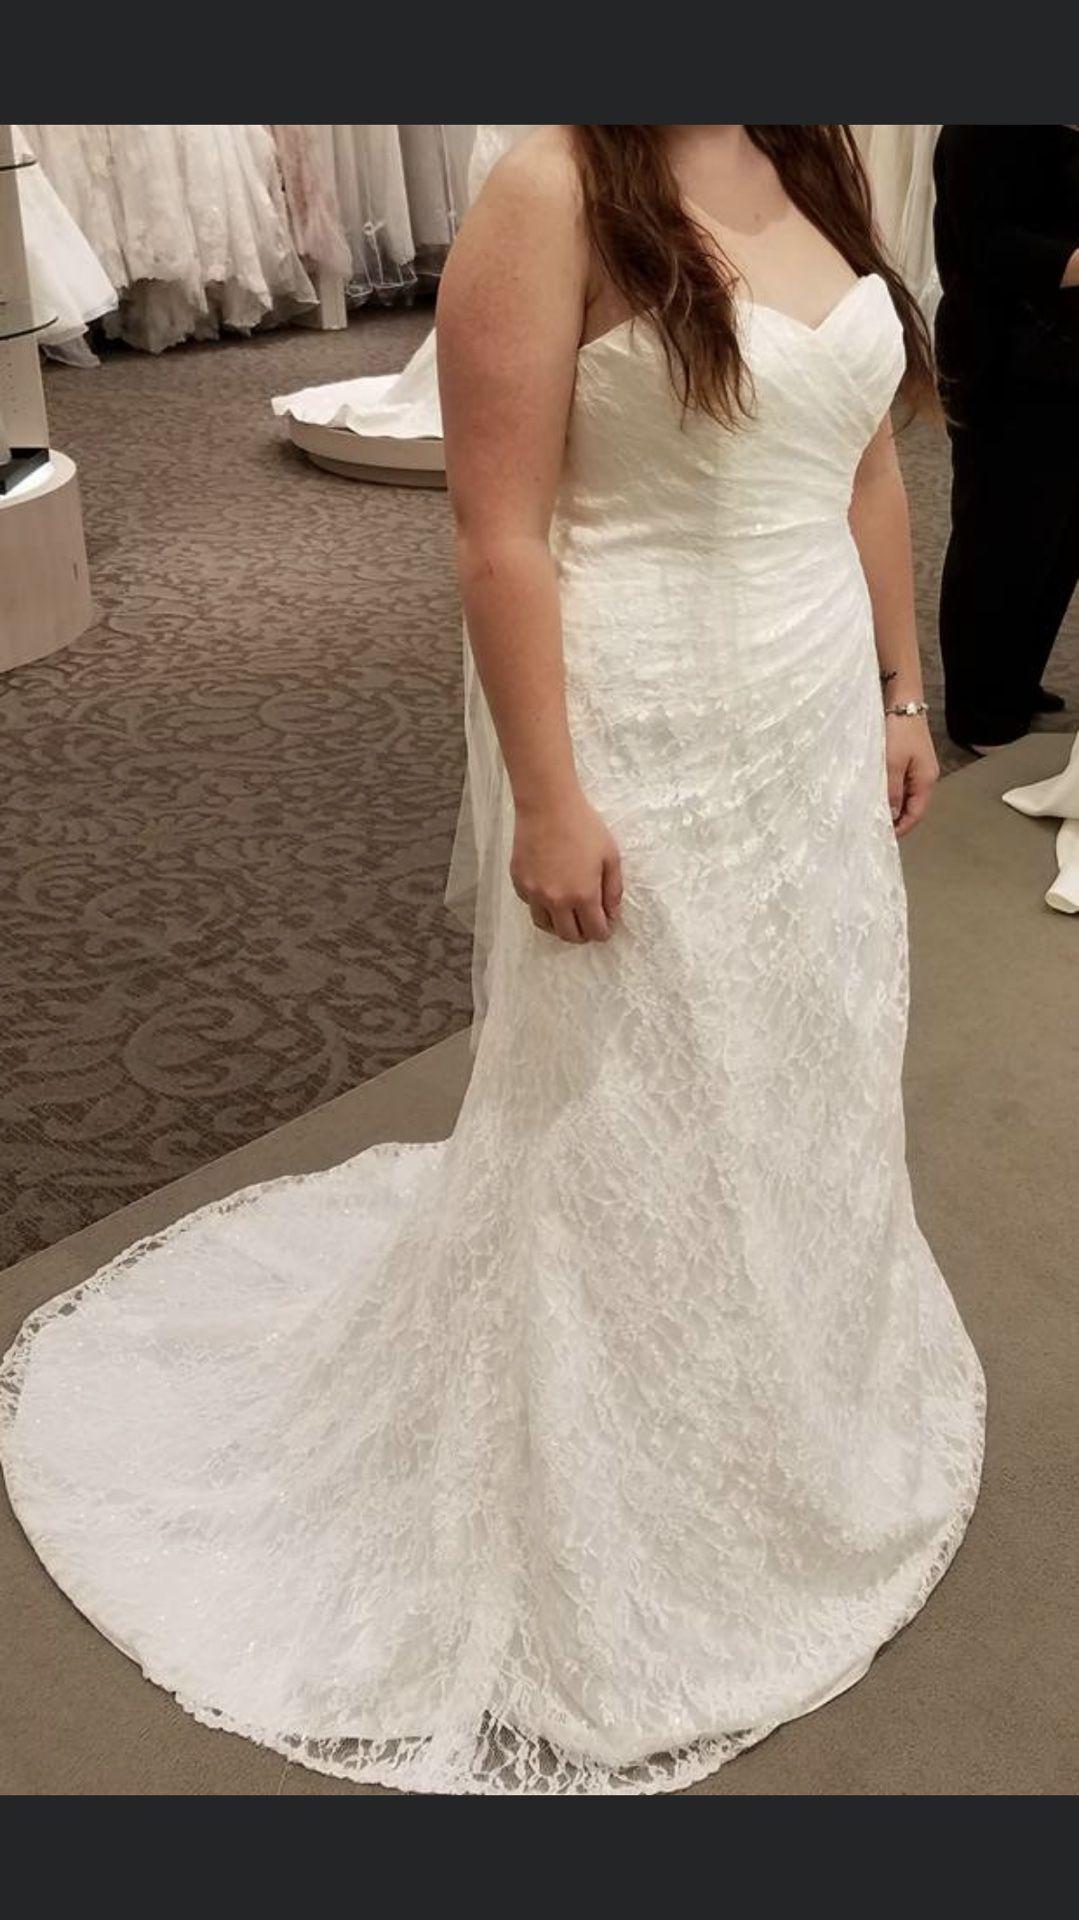 NEW beautiful Ivory wedding dress size 10